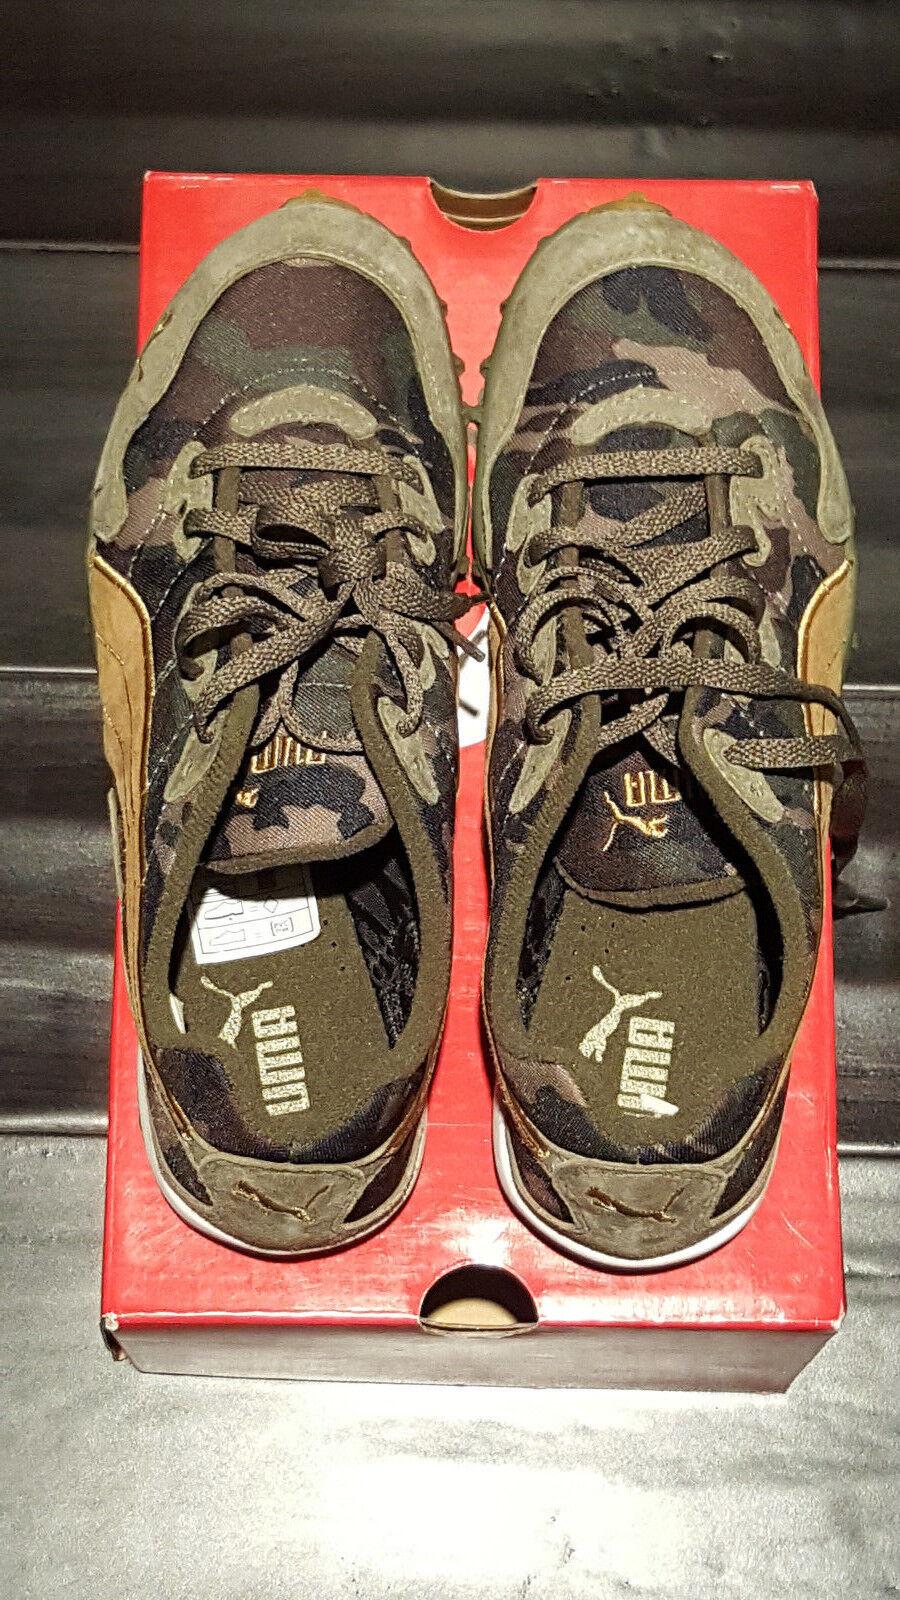 Puma La Bamba camo running shoes